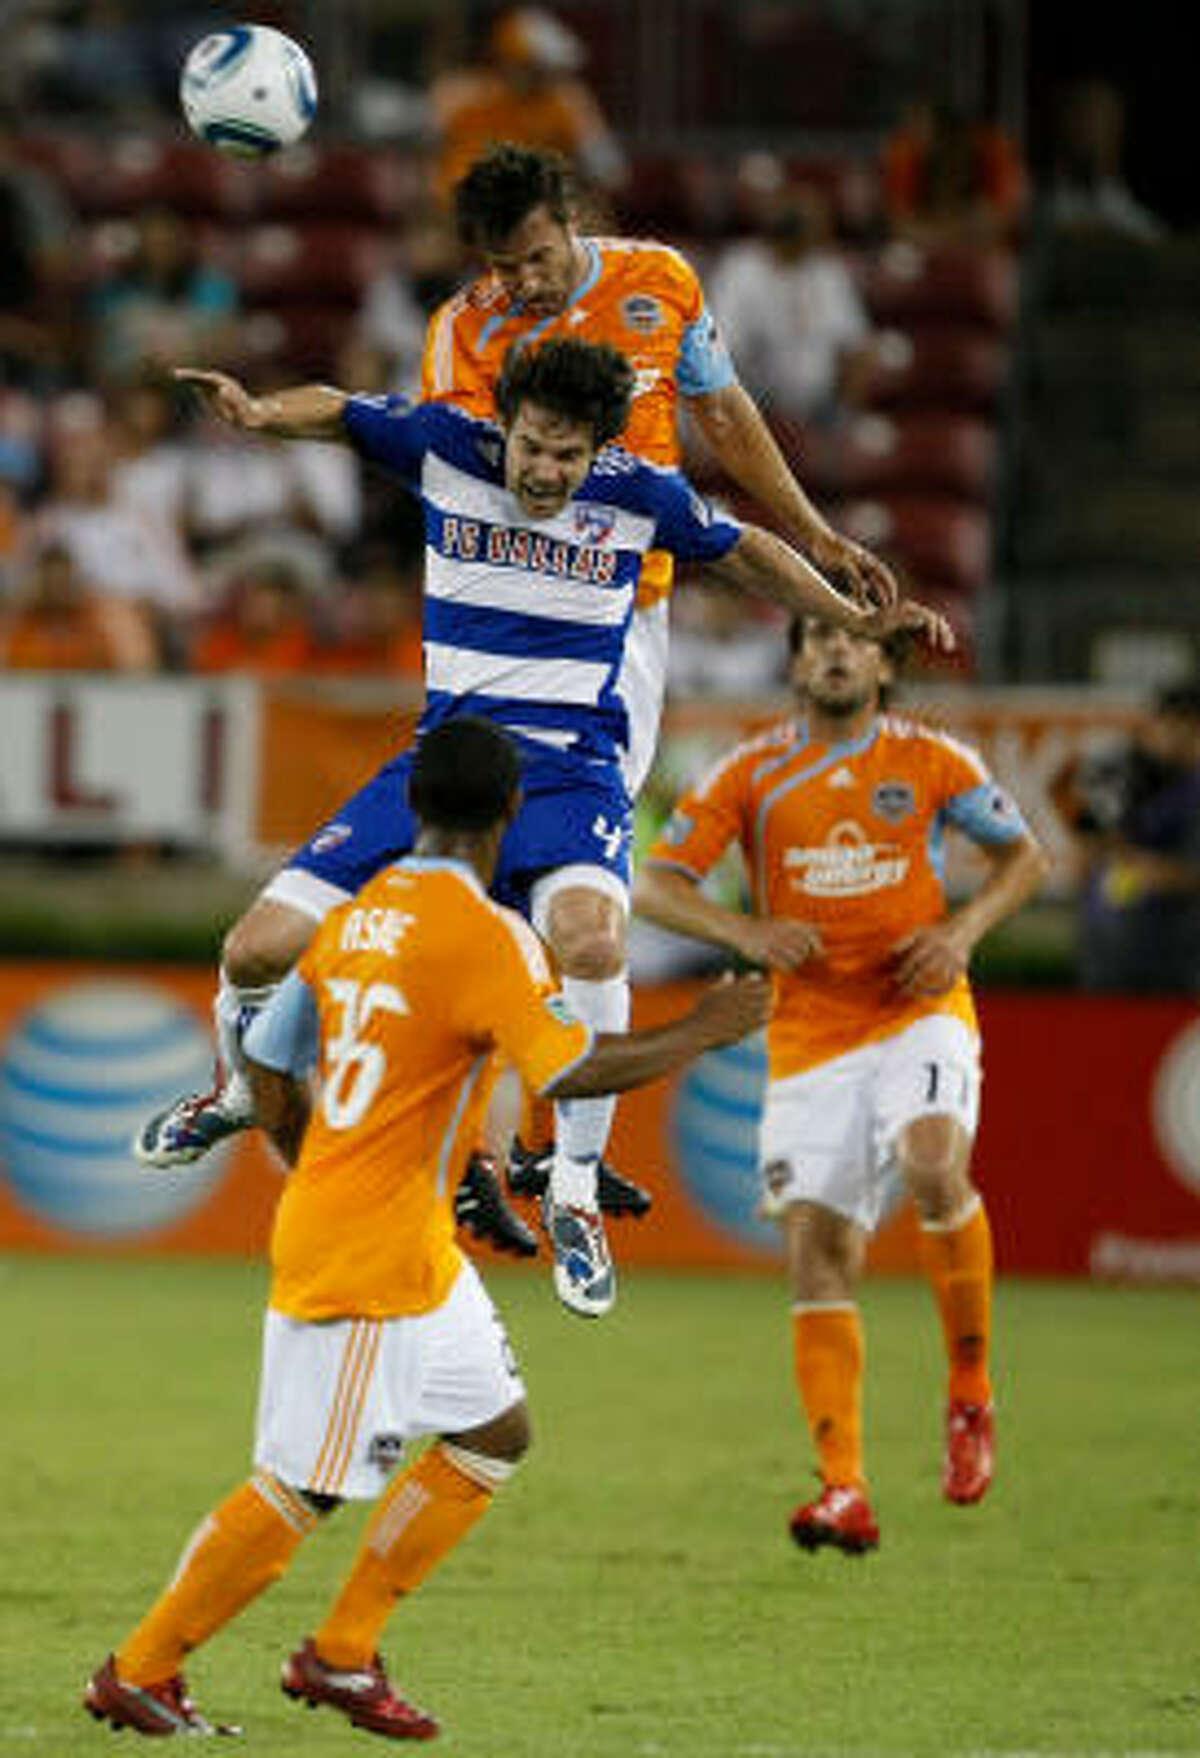 FC Dallas midfielder Heath Pearce and Dynamo defender Eddie Robinson go up for the ball in the first half.